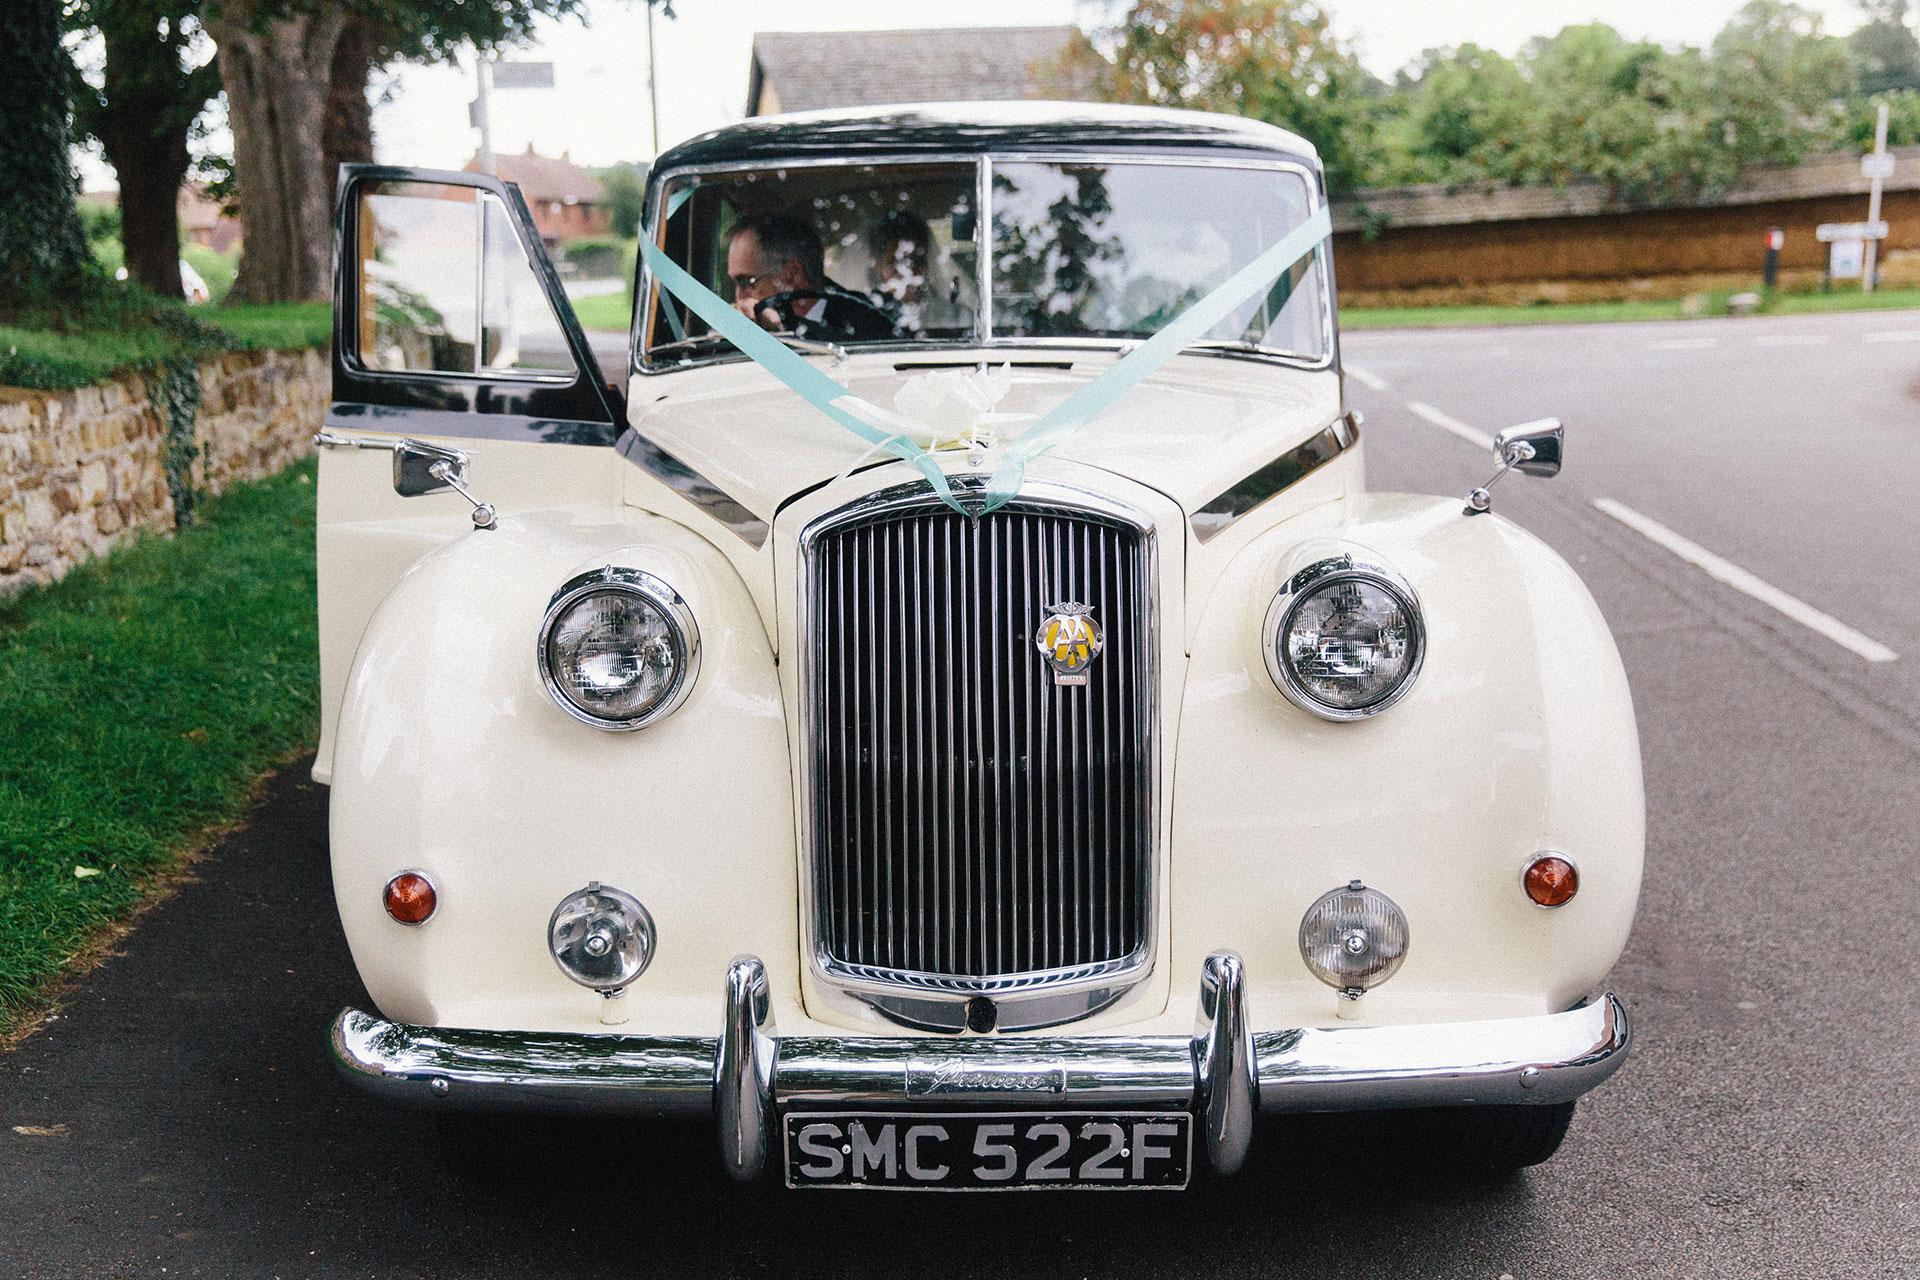 Langar-Hall-wedding-photographer-in-Nottinghamshire-Michael-Newington-Gray-39.jpg